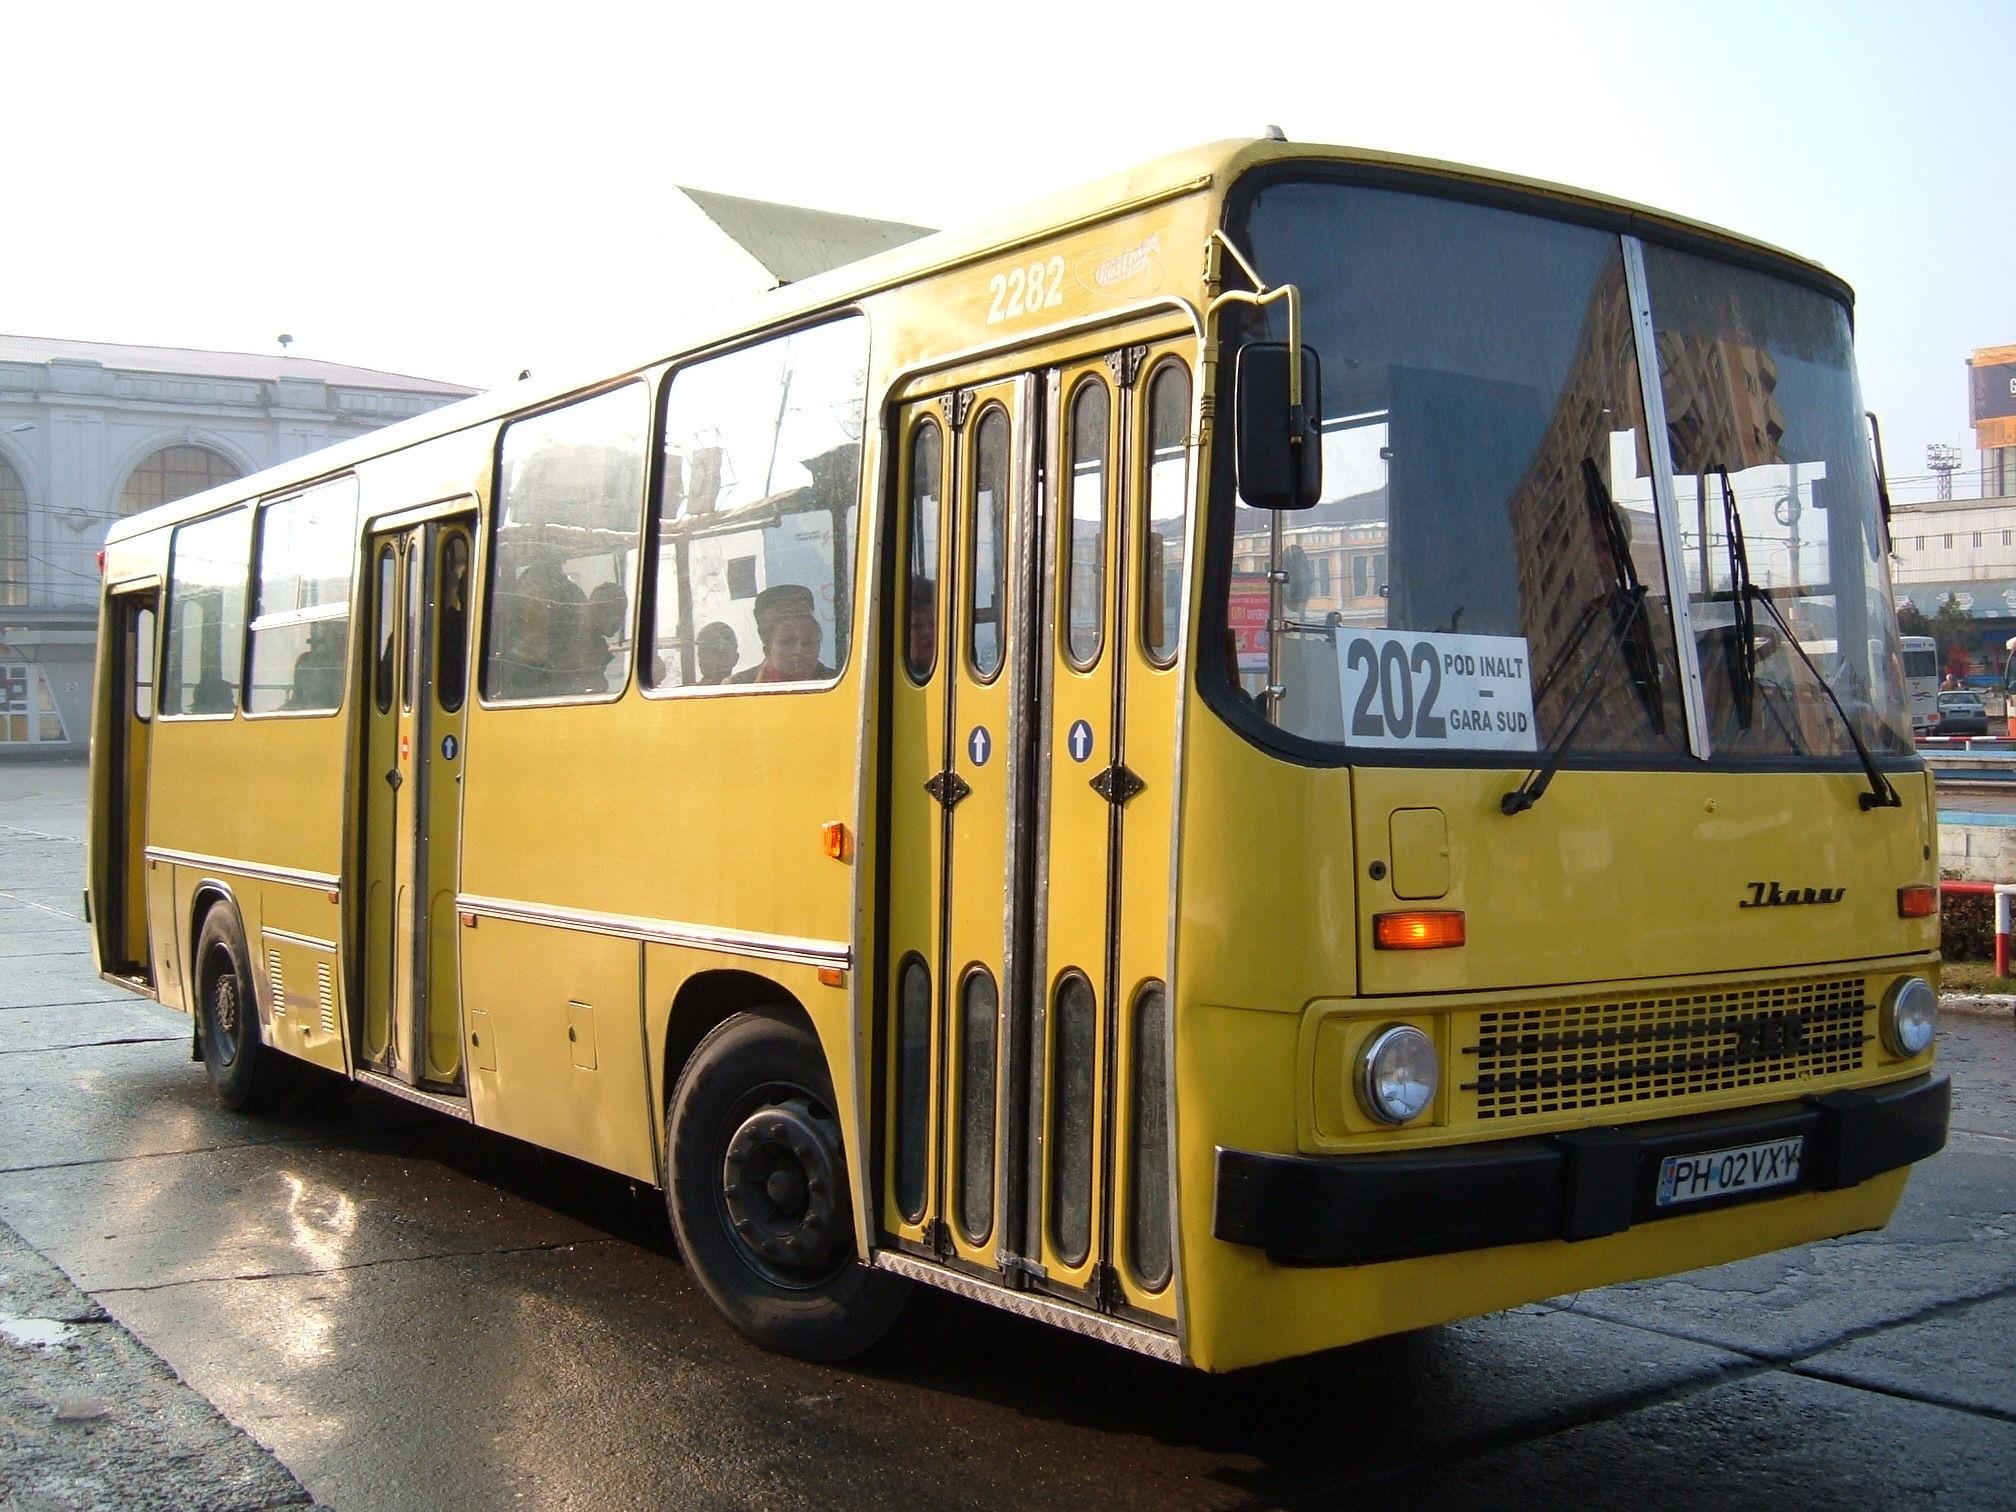 2282. Bus Ikarus on line 202. November 24, 2006